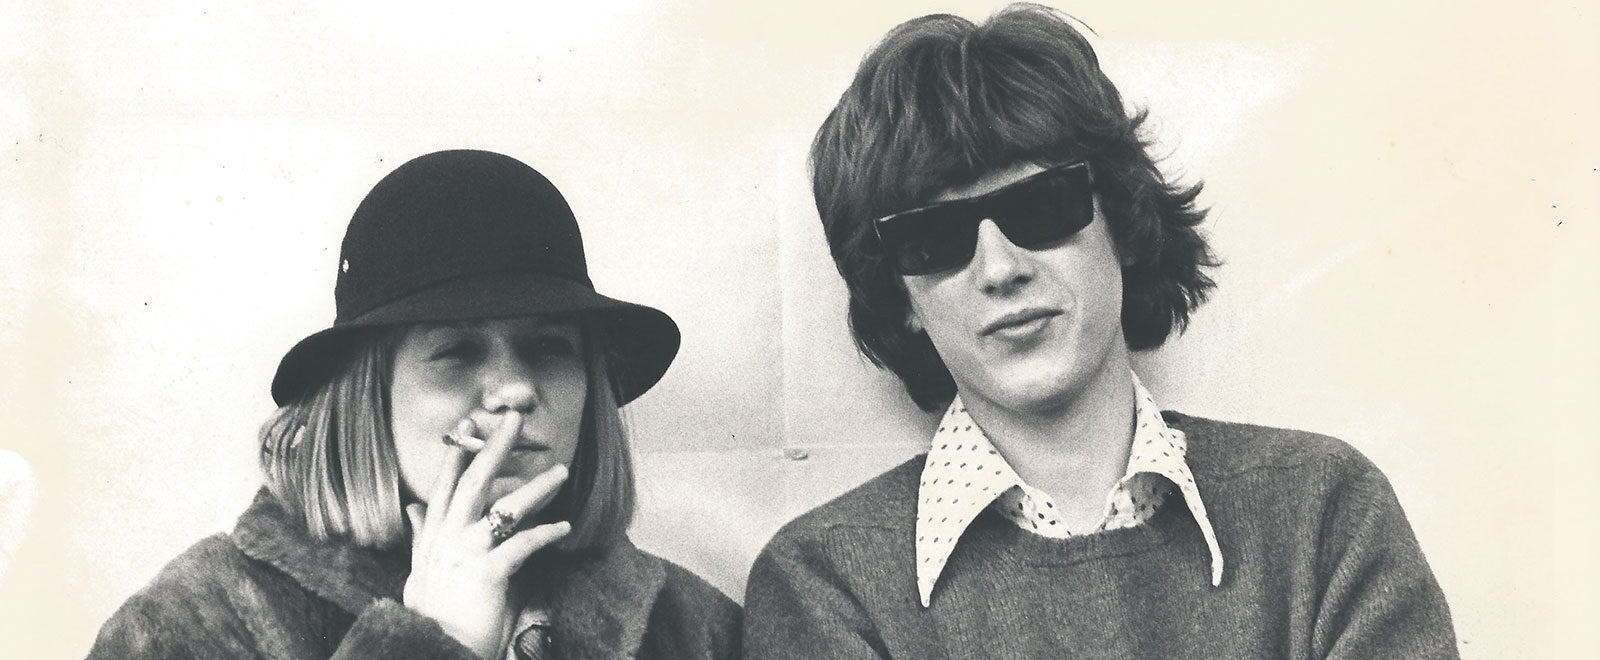 Talking Heads Chris Frantz Tina Weymouth David Byrne Memoir Remain in Love